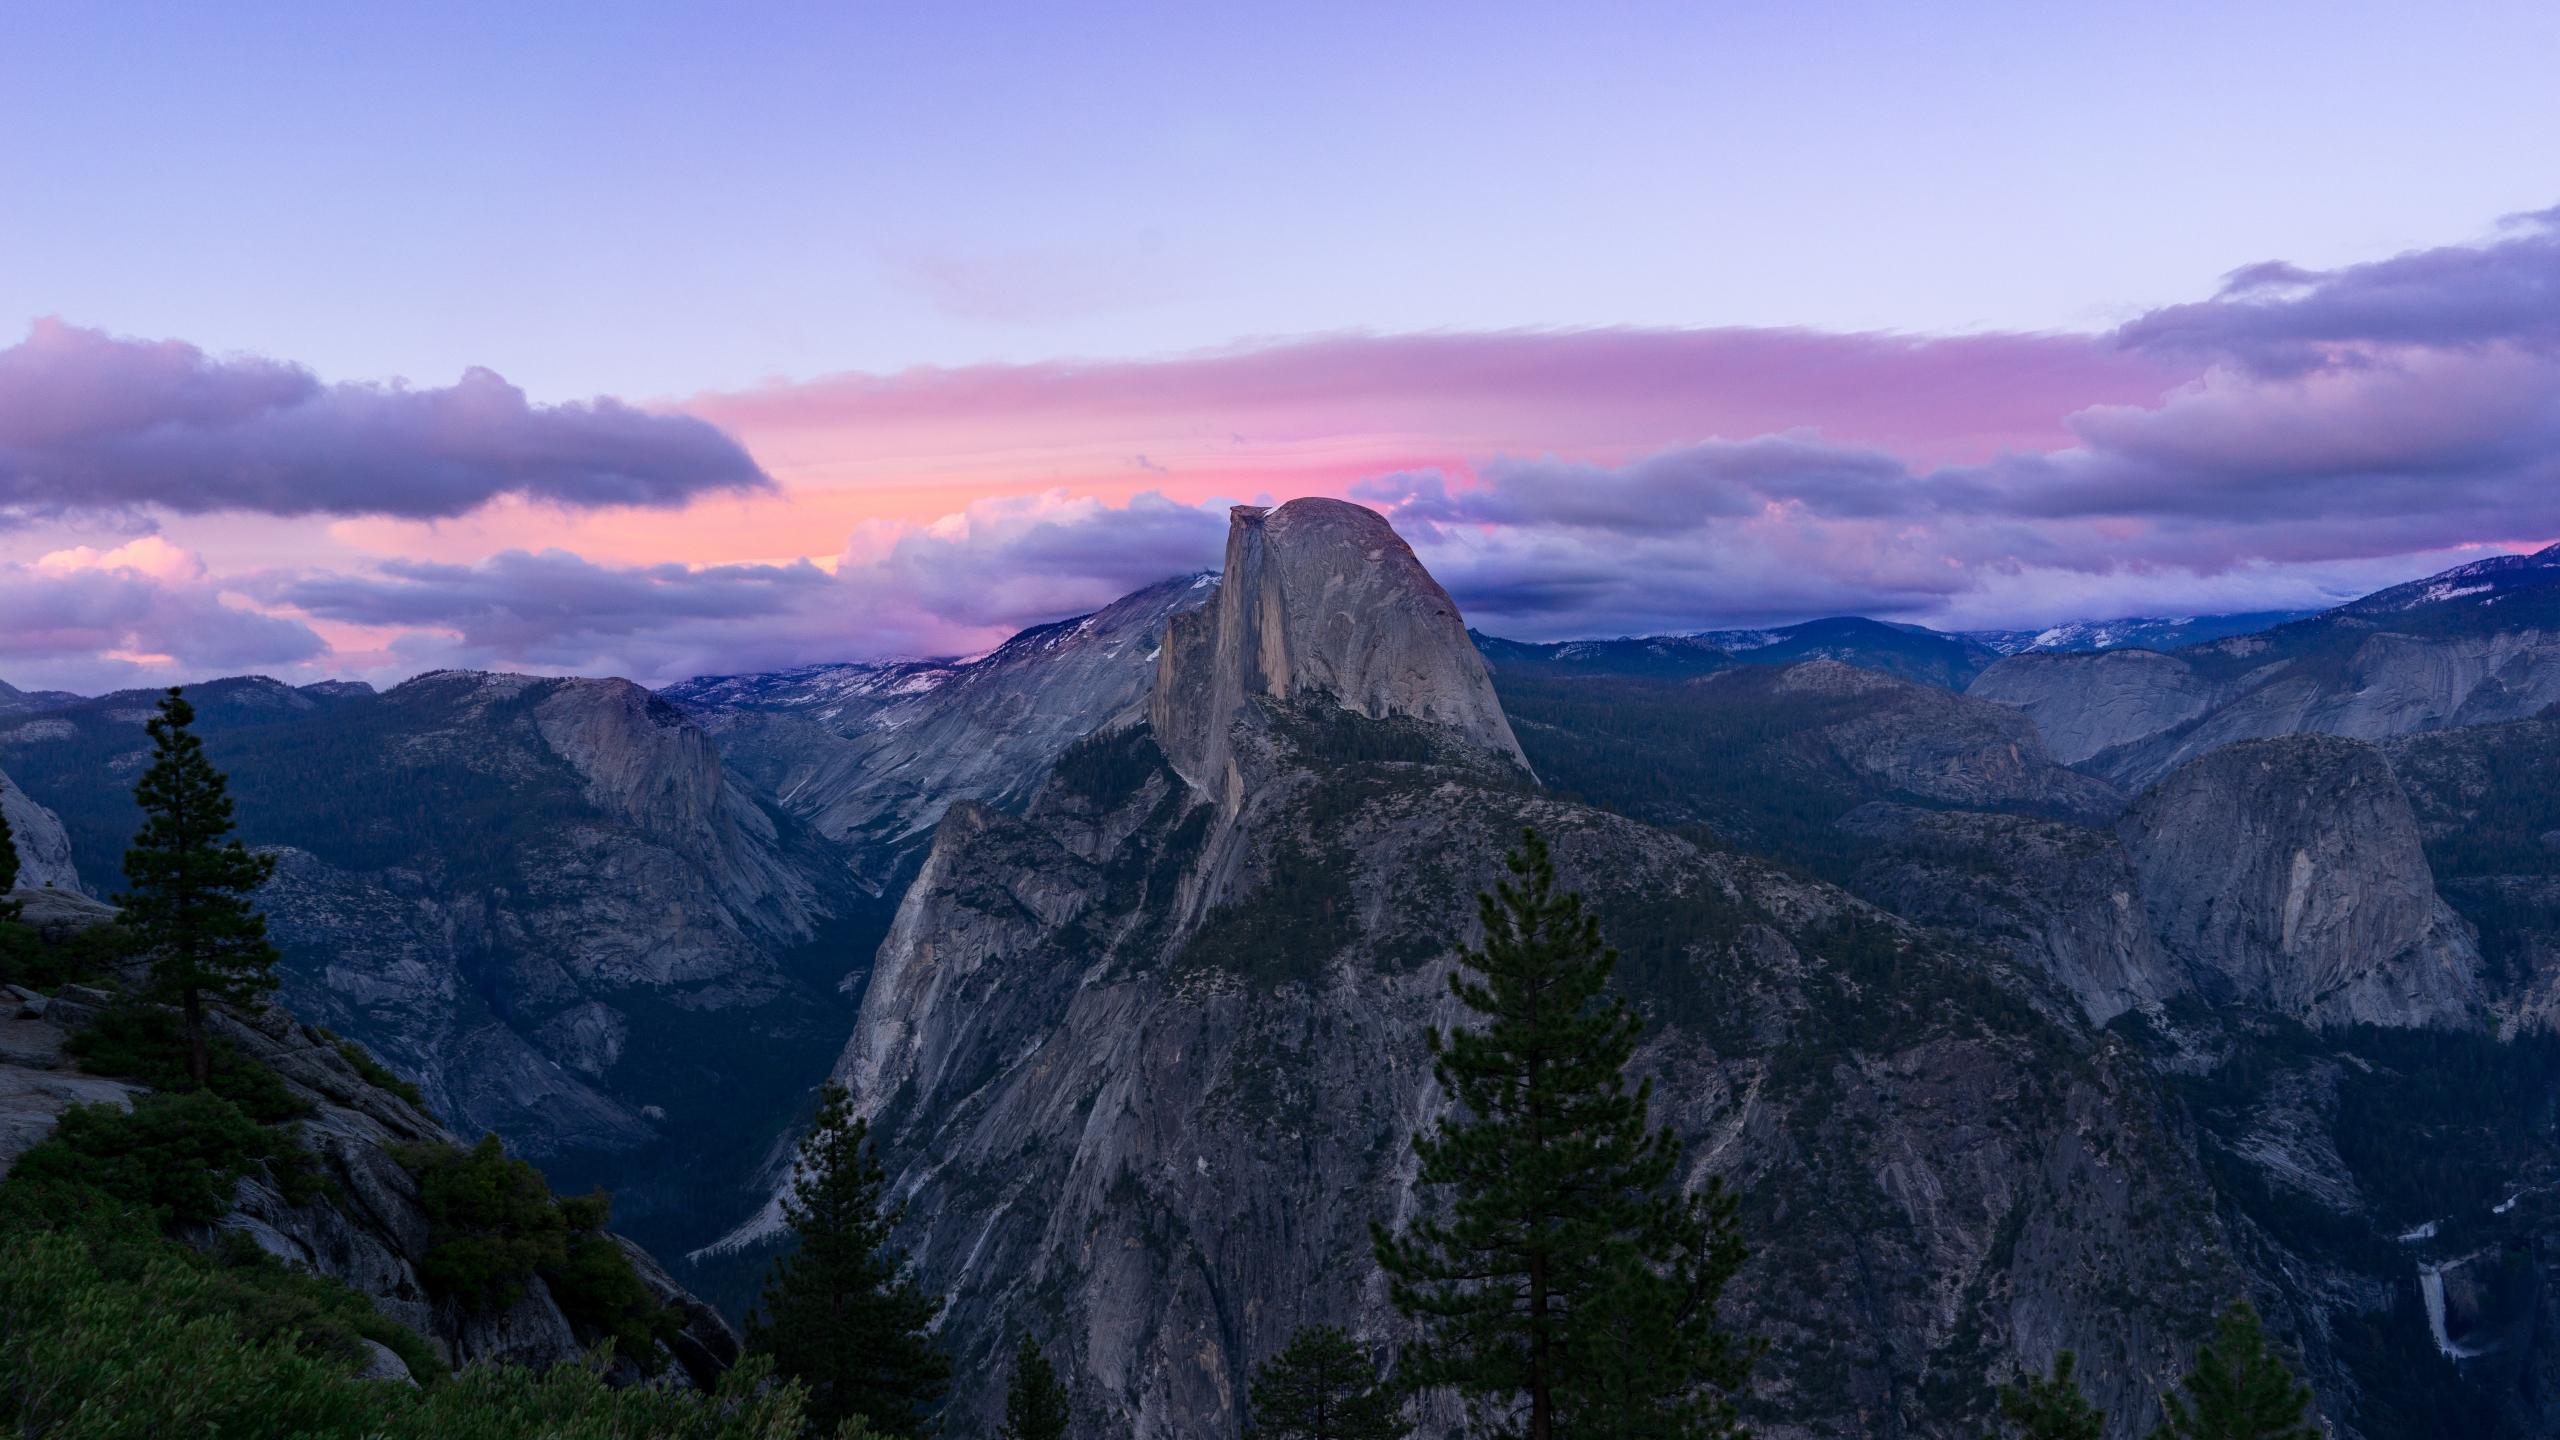 Great Wallpaper Mountain 1440p - mountains-and-sunset-wallpaper  Snapshot_4590100.jpg